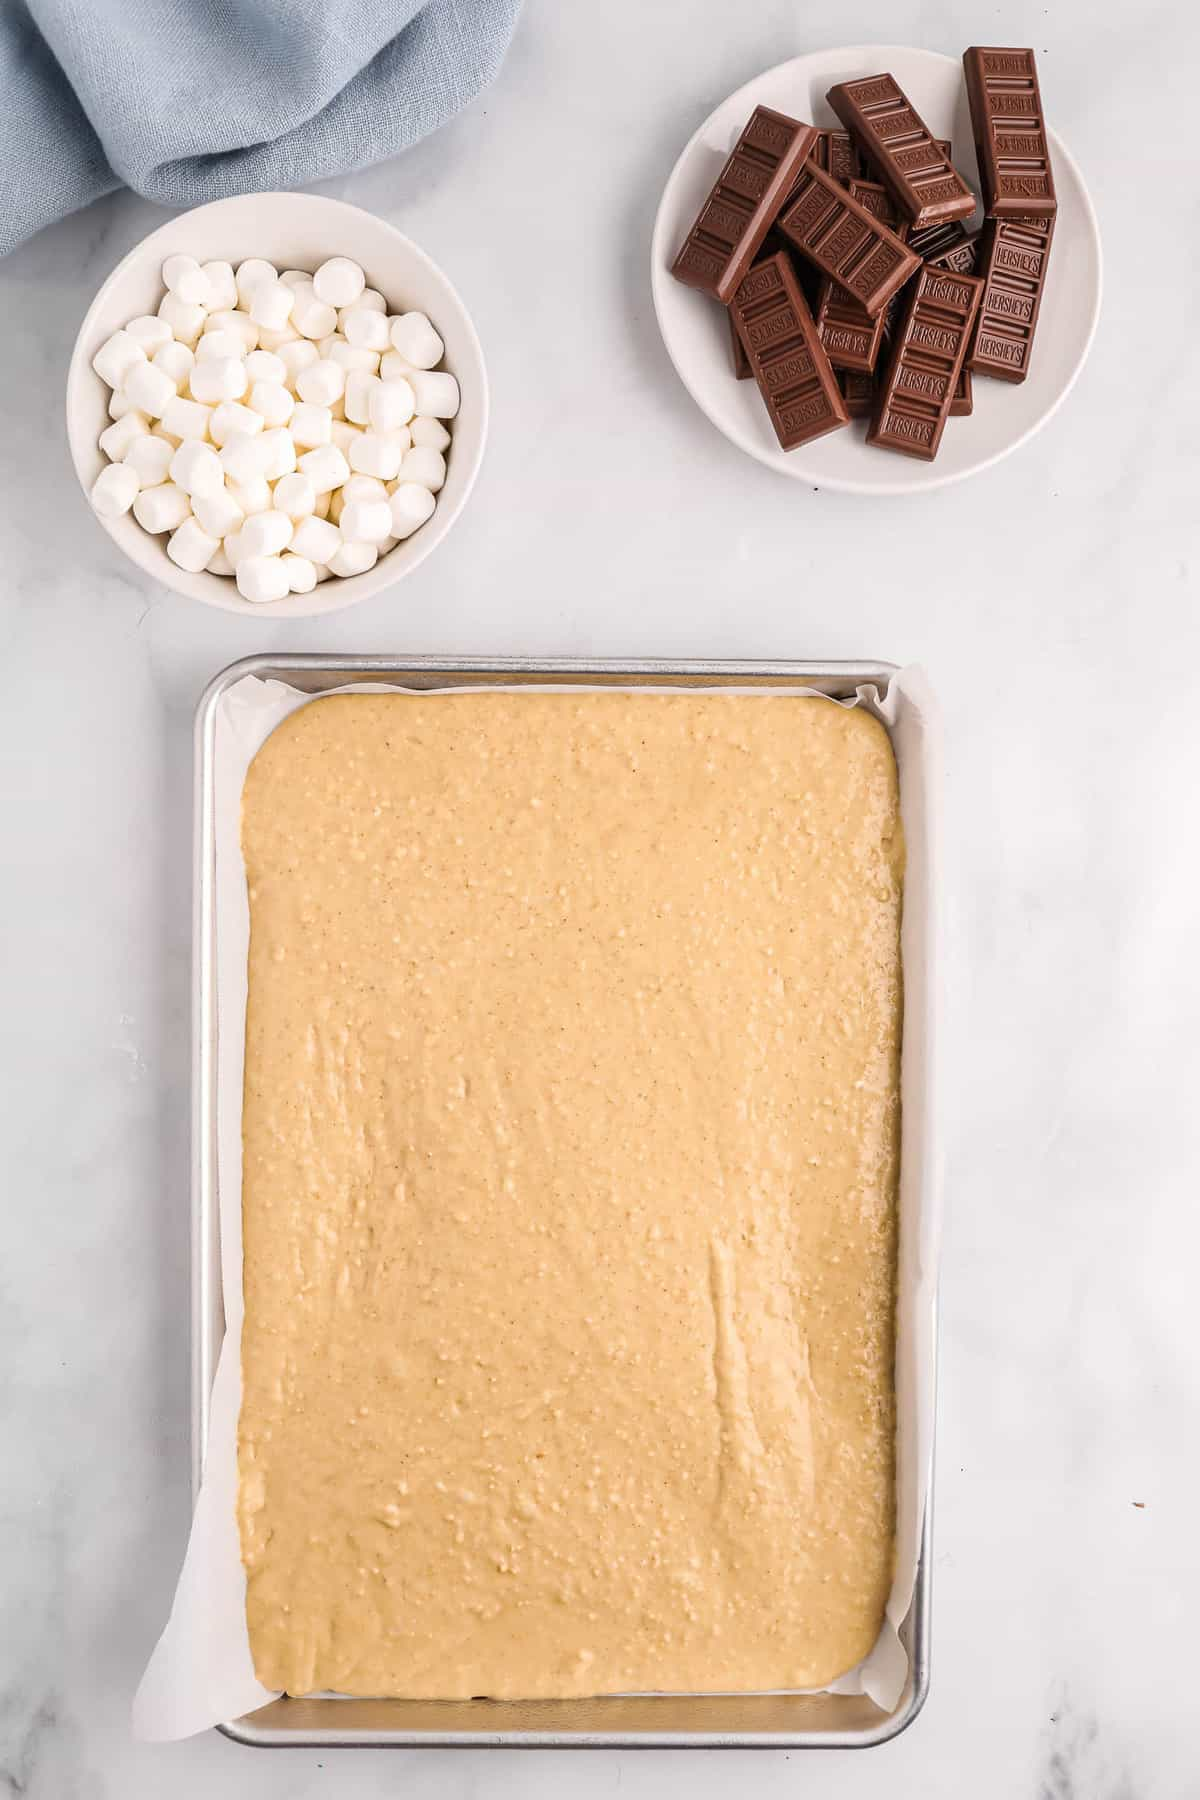 Pancake batter spread onto a sheet pan.